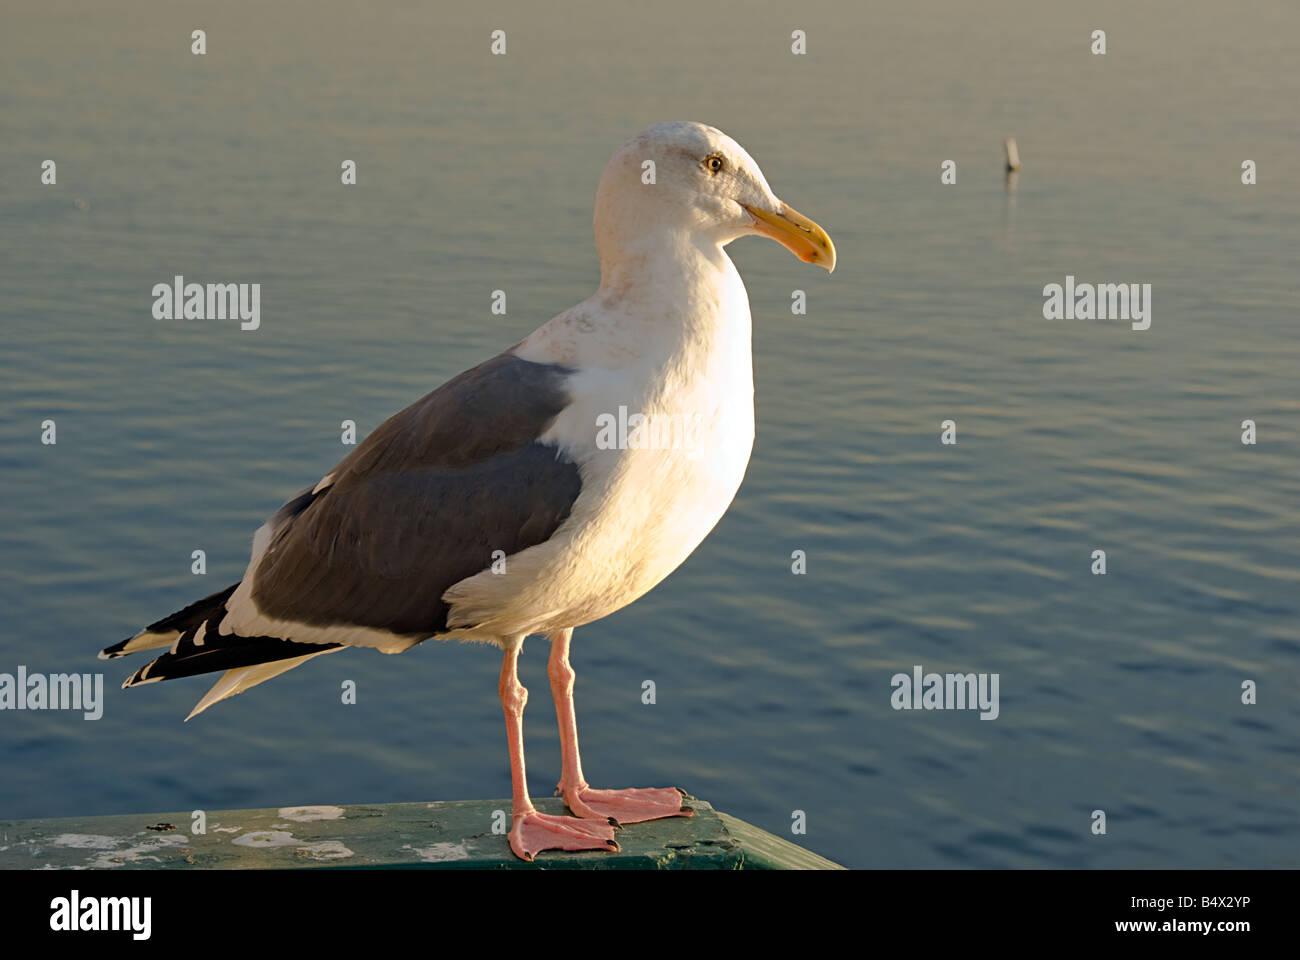 Gaviota macho de la Bahía de Santa Mónica, CA Pacific Park Pier Foto de stock